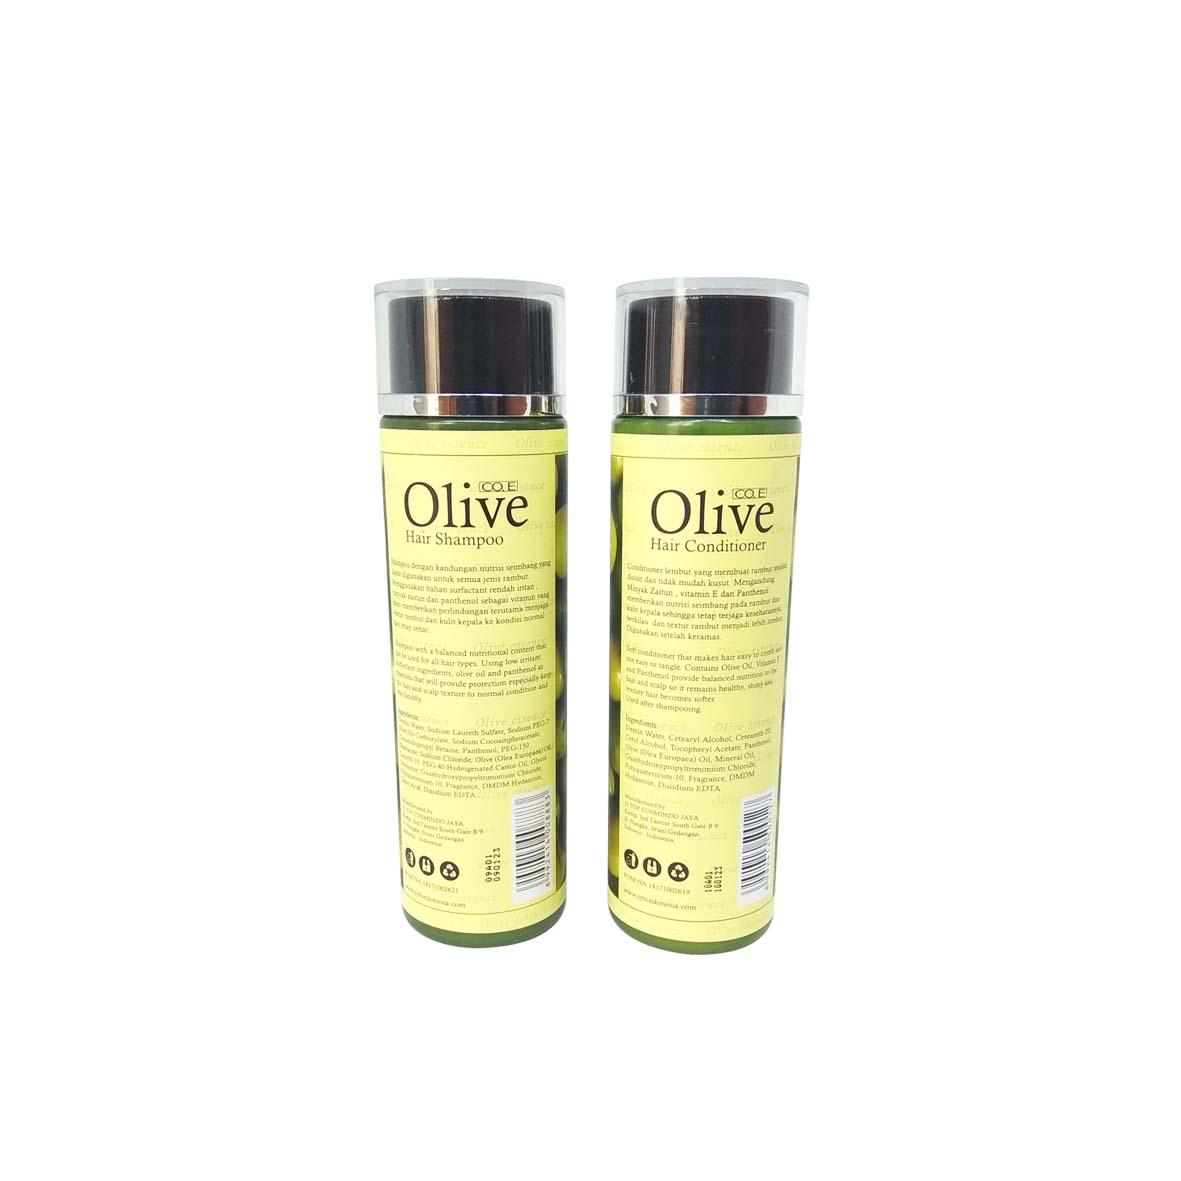 Fitur Paket Olive Hair Shampoo Dan Conditoner Harga Terbaru Makarizo Energy Conditioning Extract 170 Ml Detail Gambar